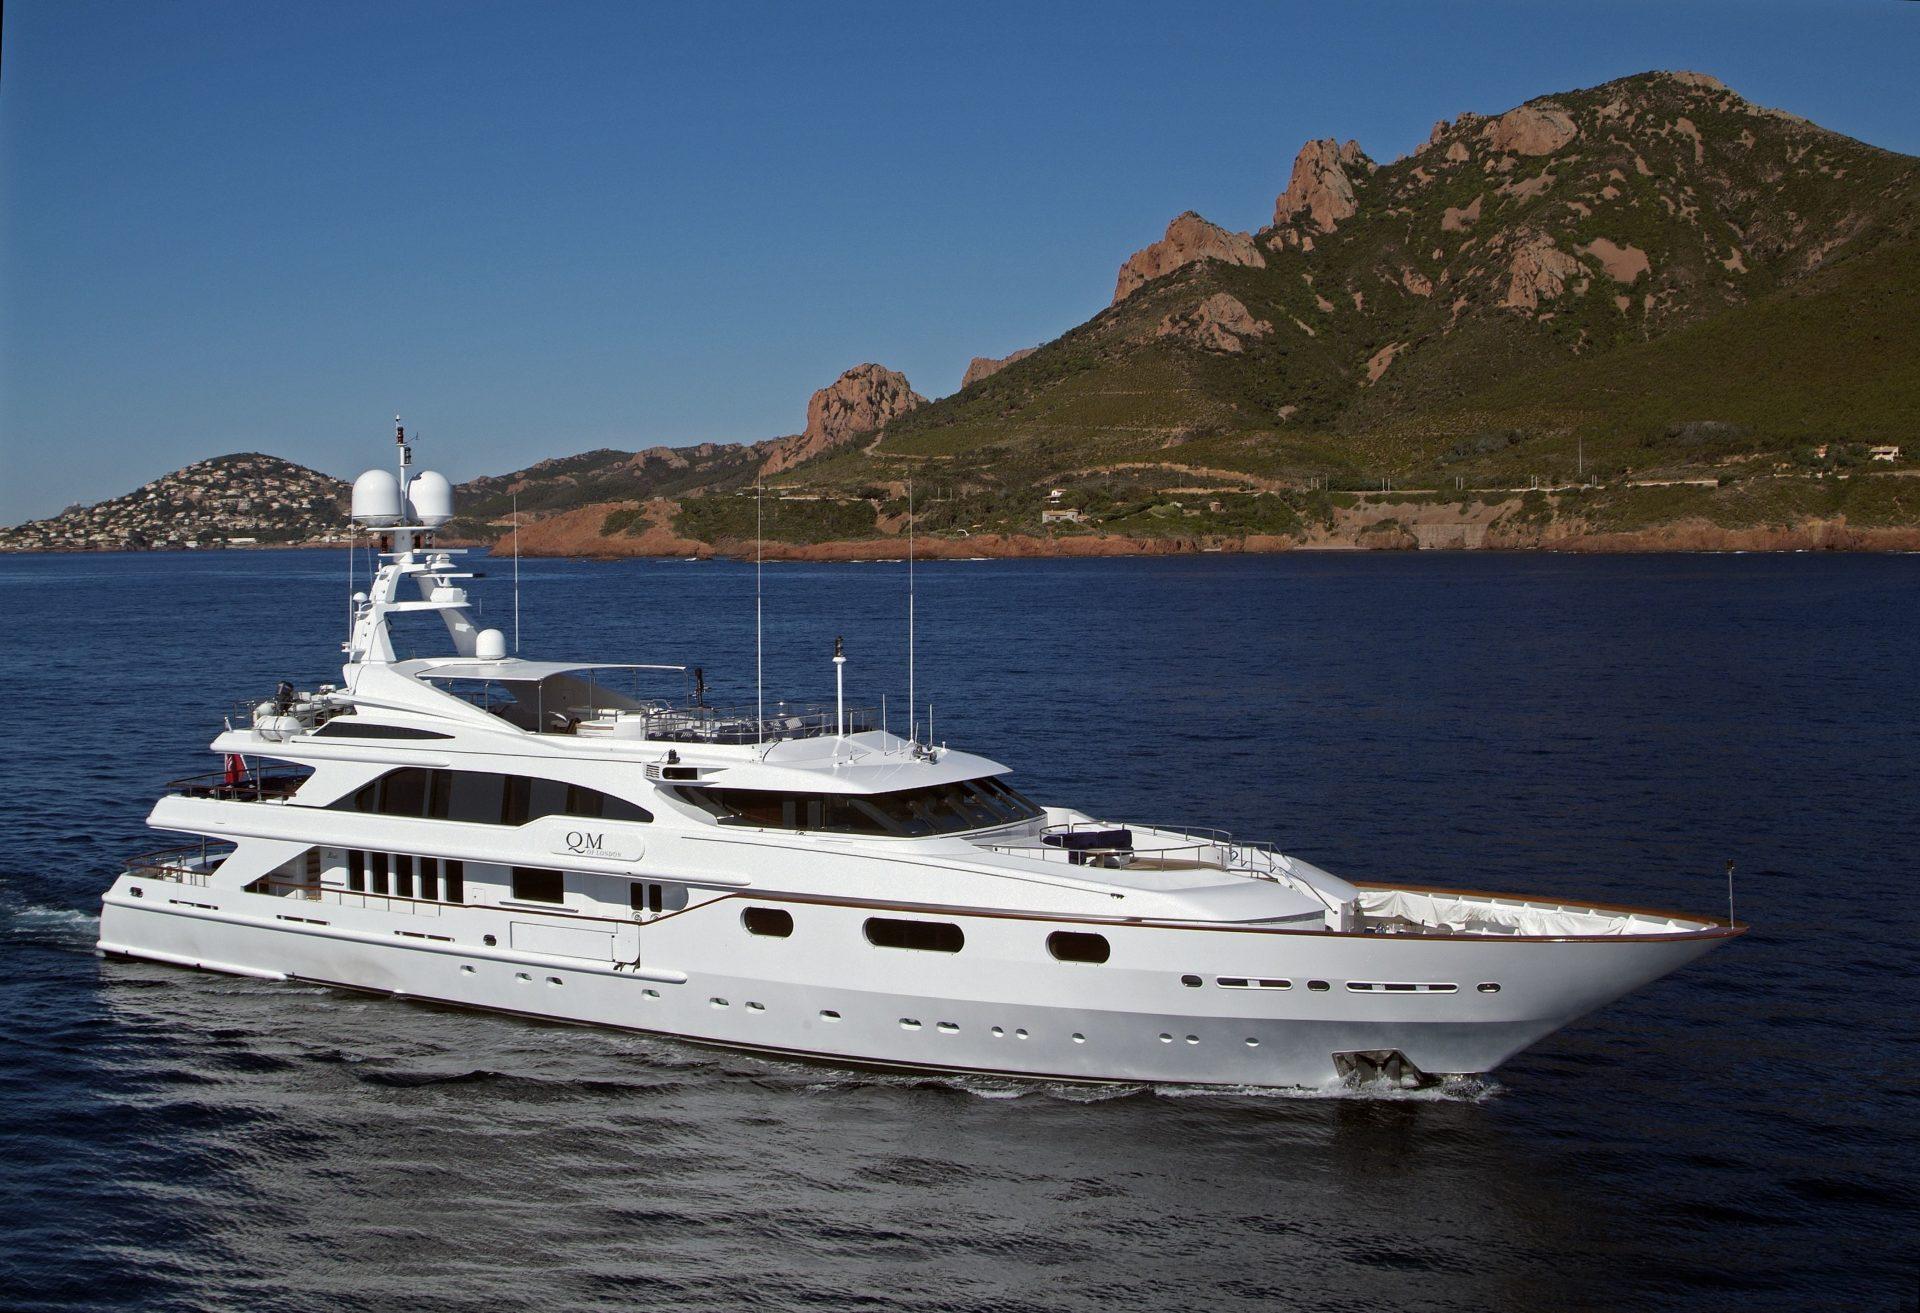 qm yacht